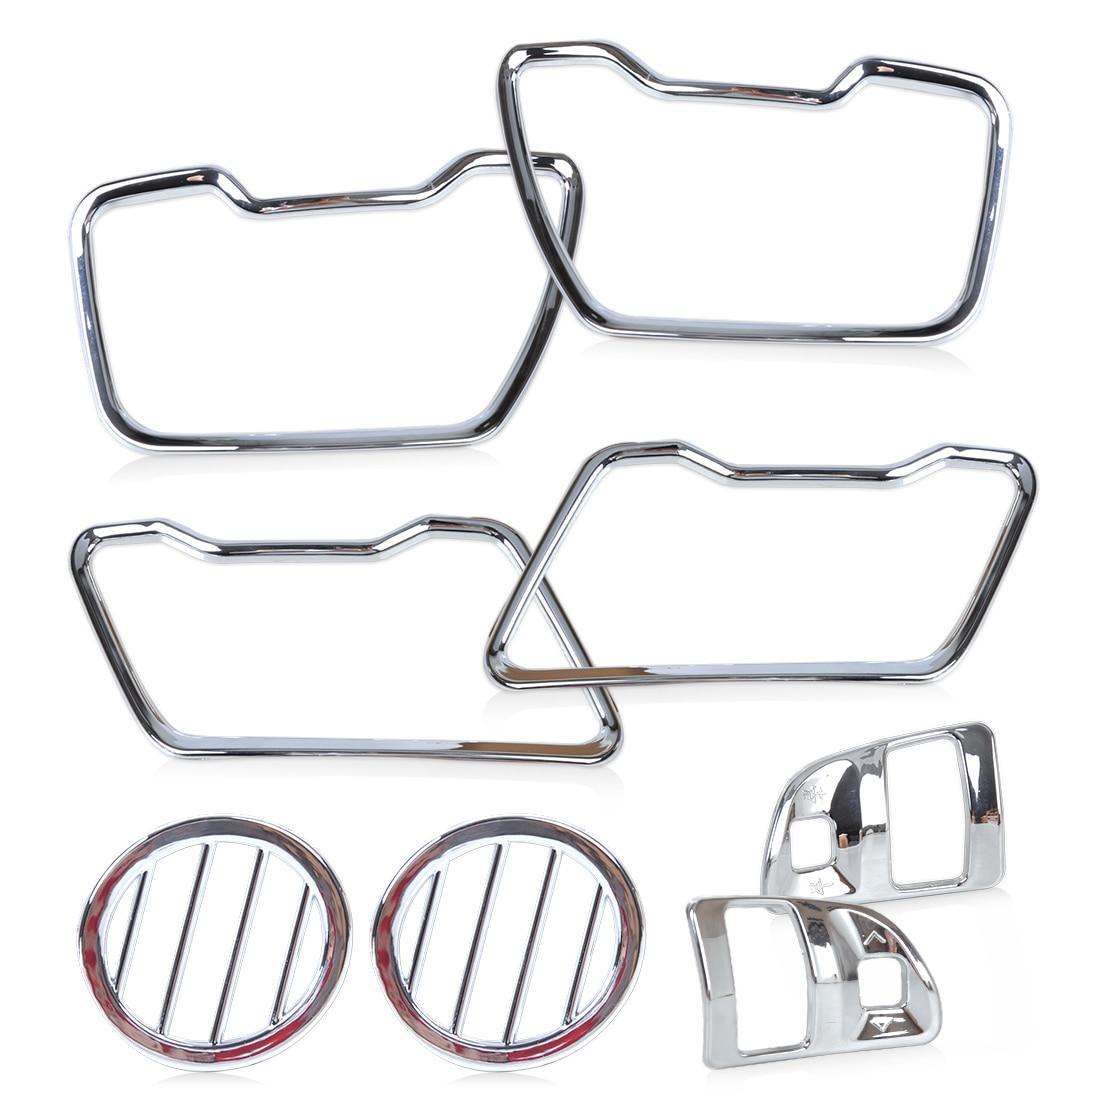 Aliexpress Buy Citall 8pcs Set Car Chrome Steering Wheel Air Vent Cover Trim Kit Left